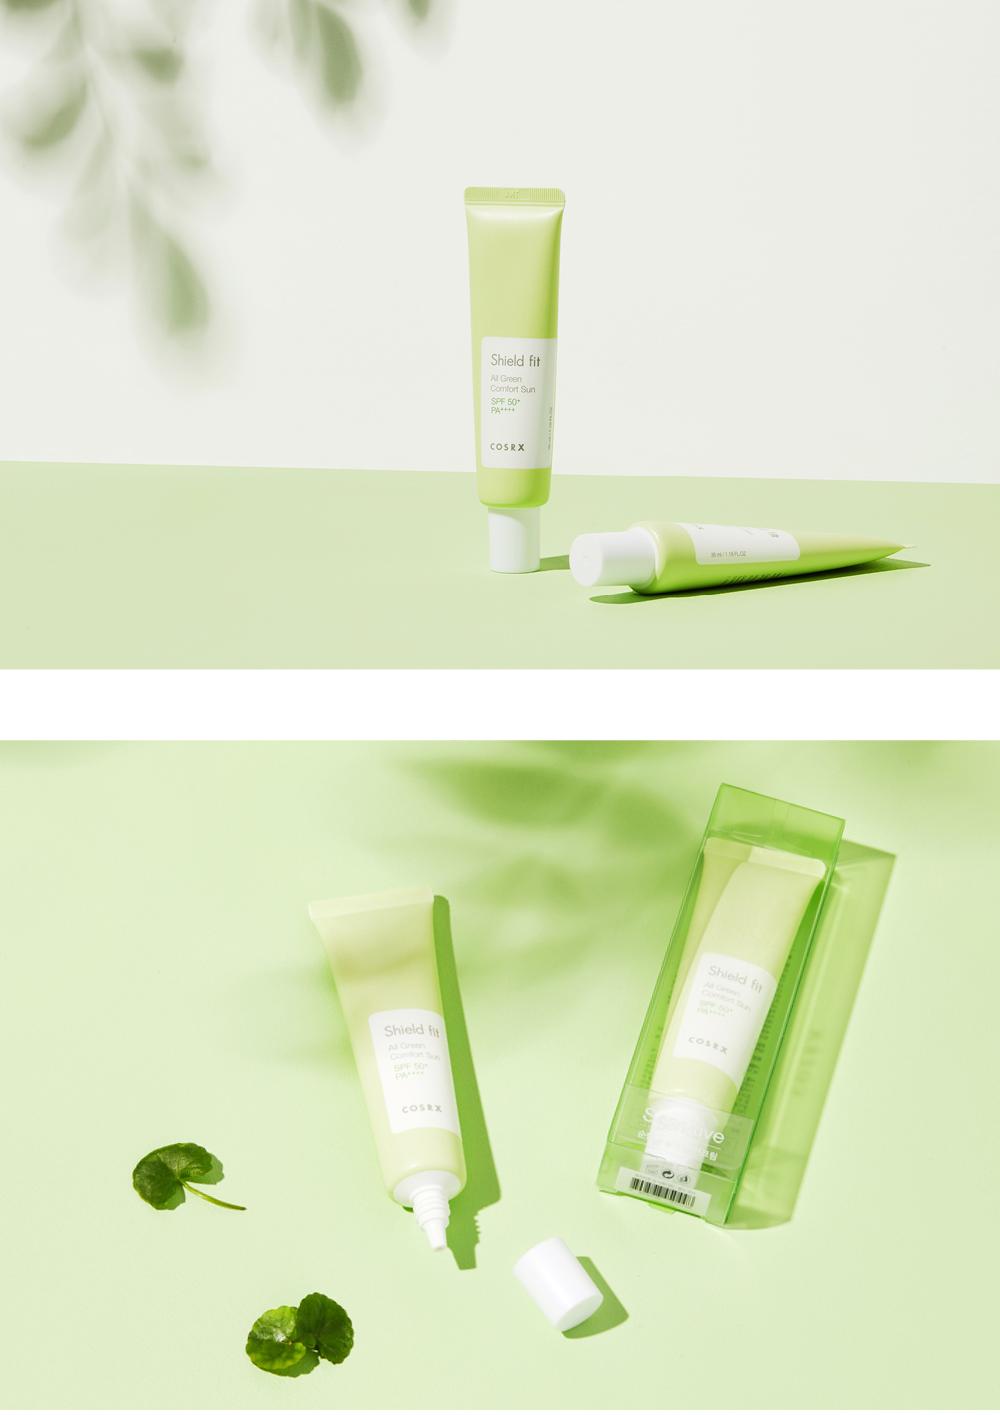 Cosrx-Shield-Fit-All-Green-Comfort-Suncream